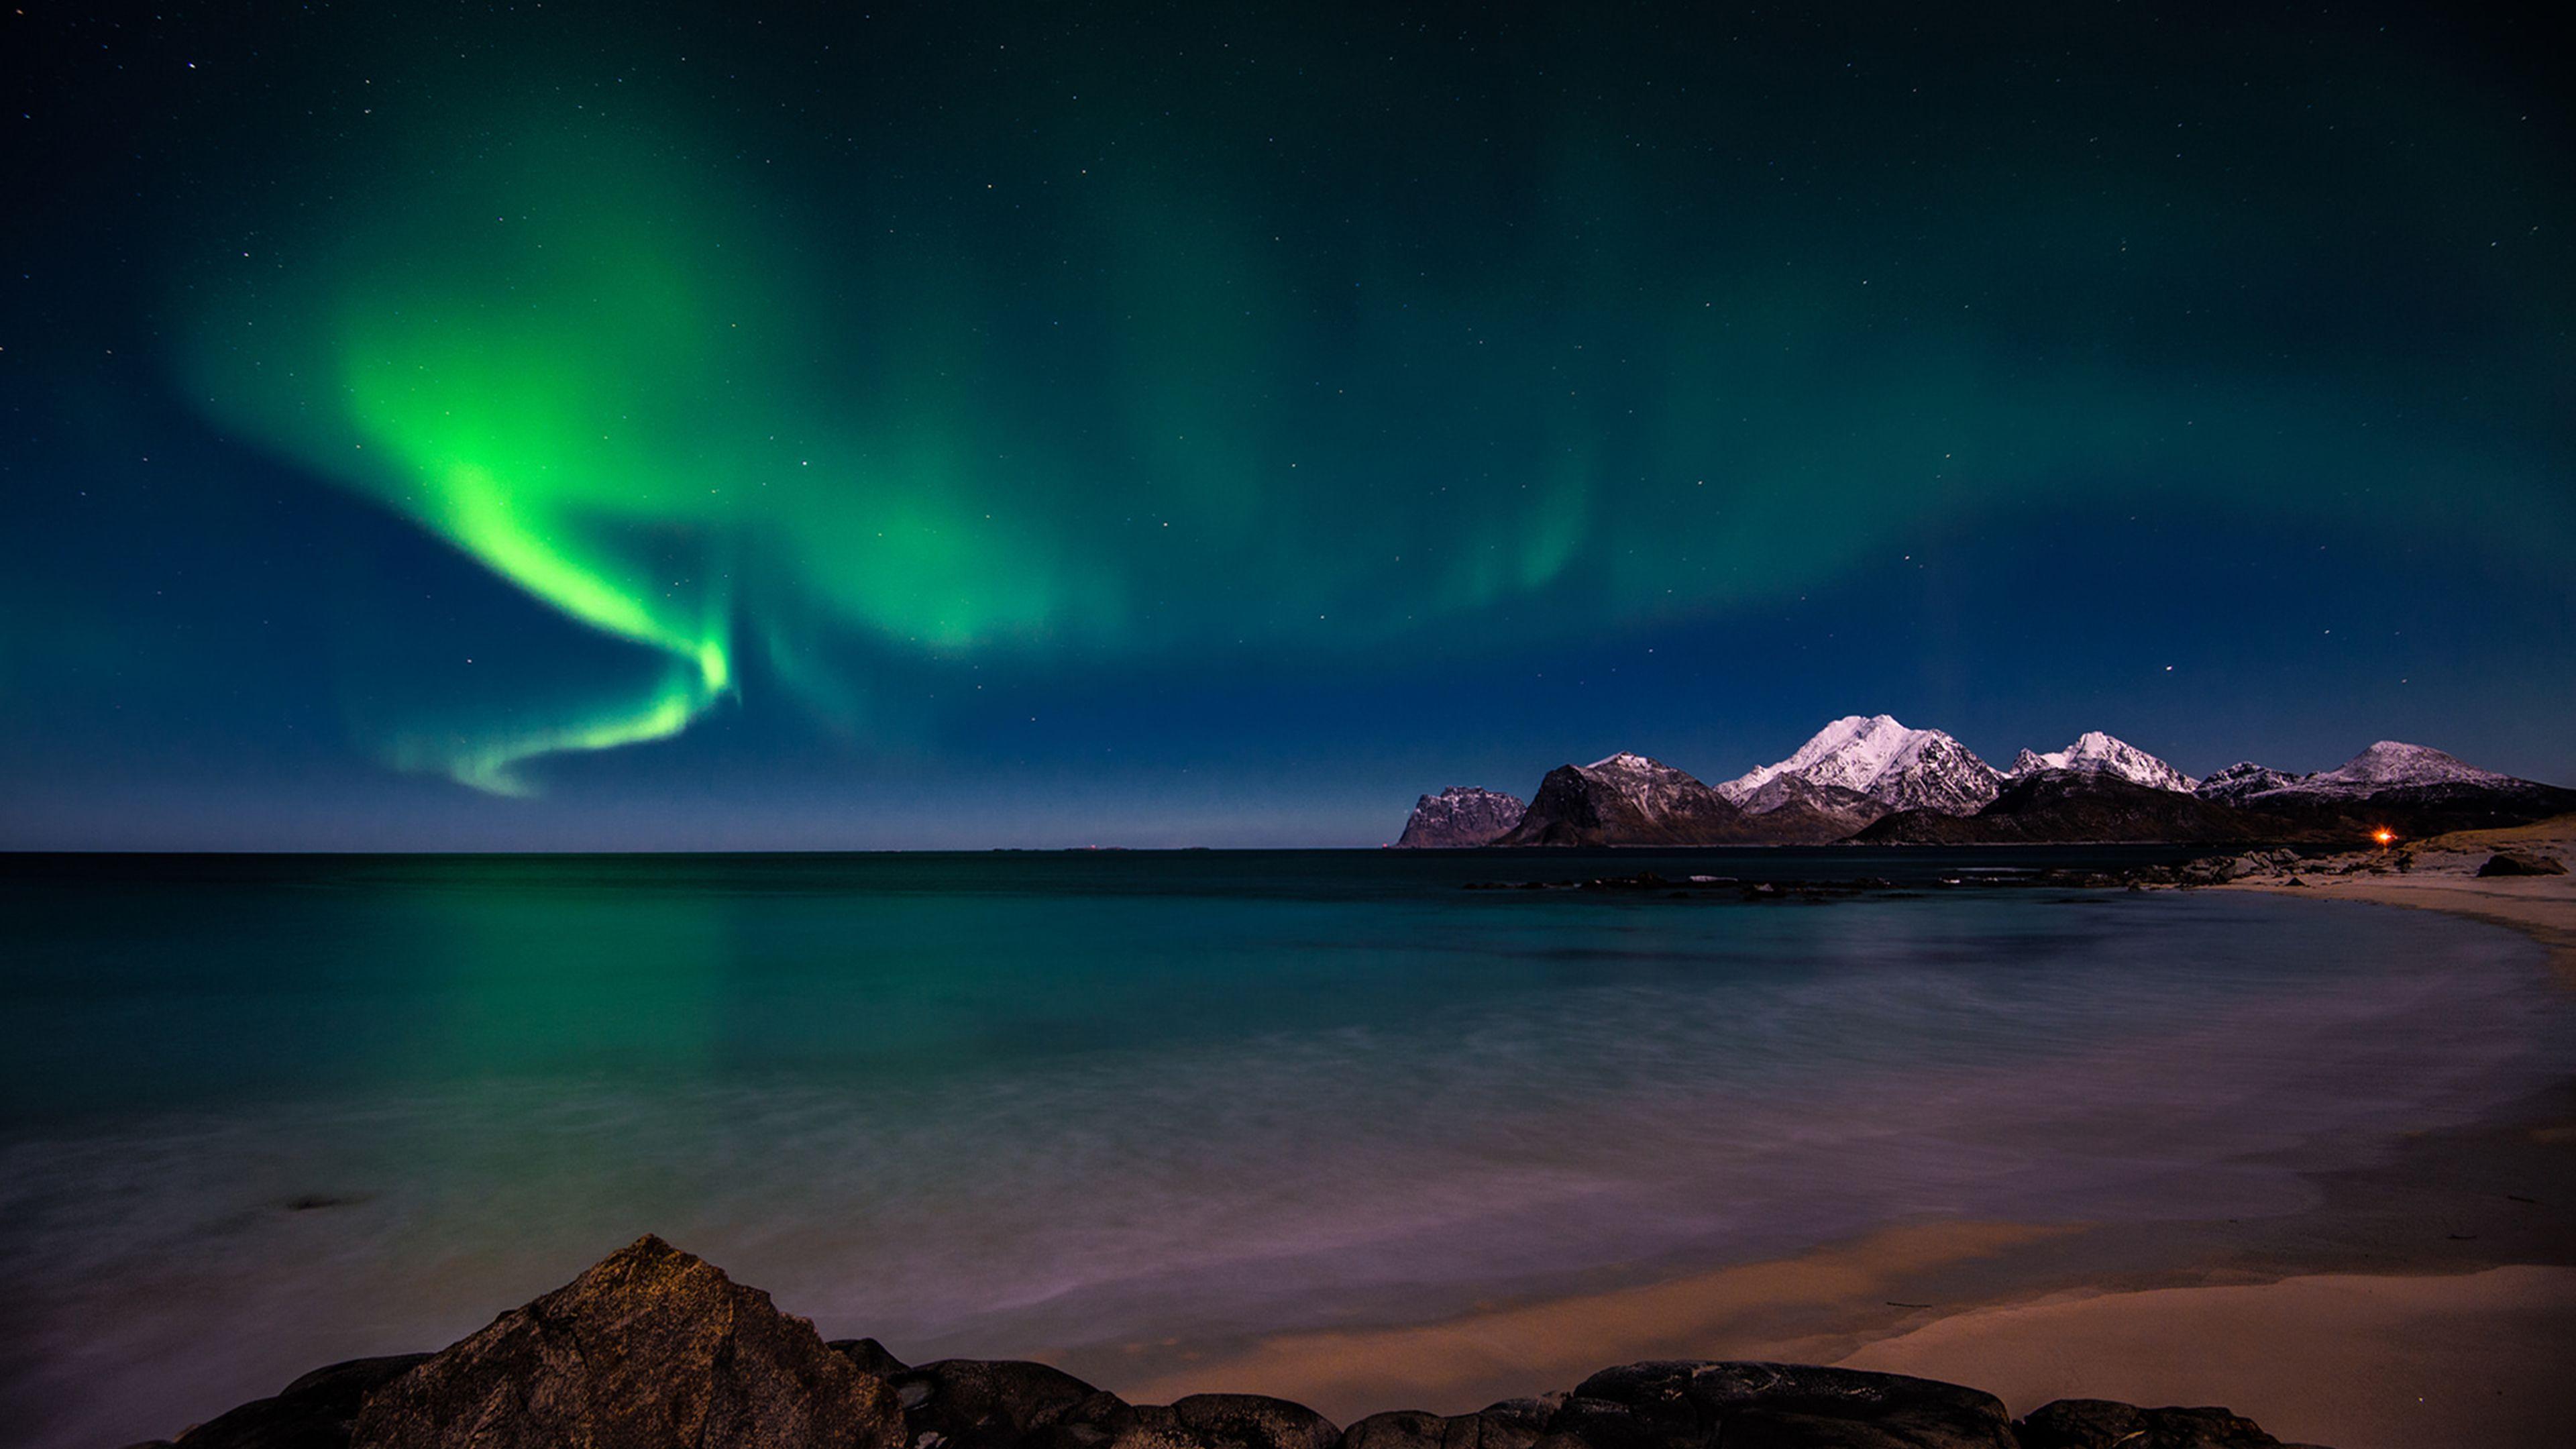 Aurora 4k Wallpapers Top Free Aurora 4k Backgrounds